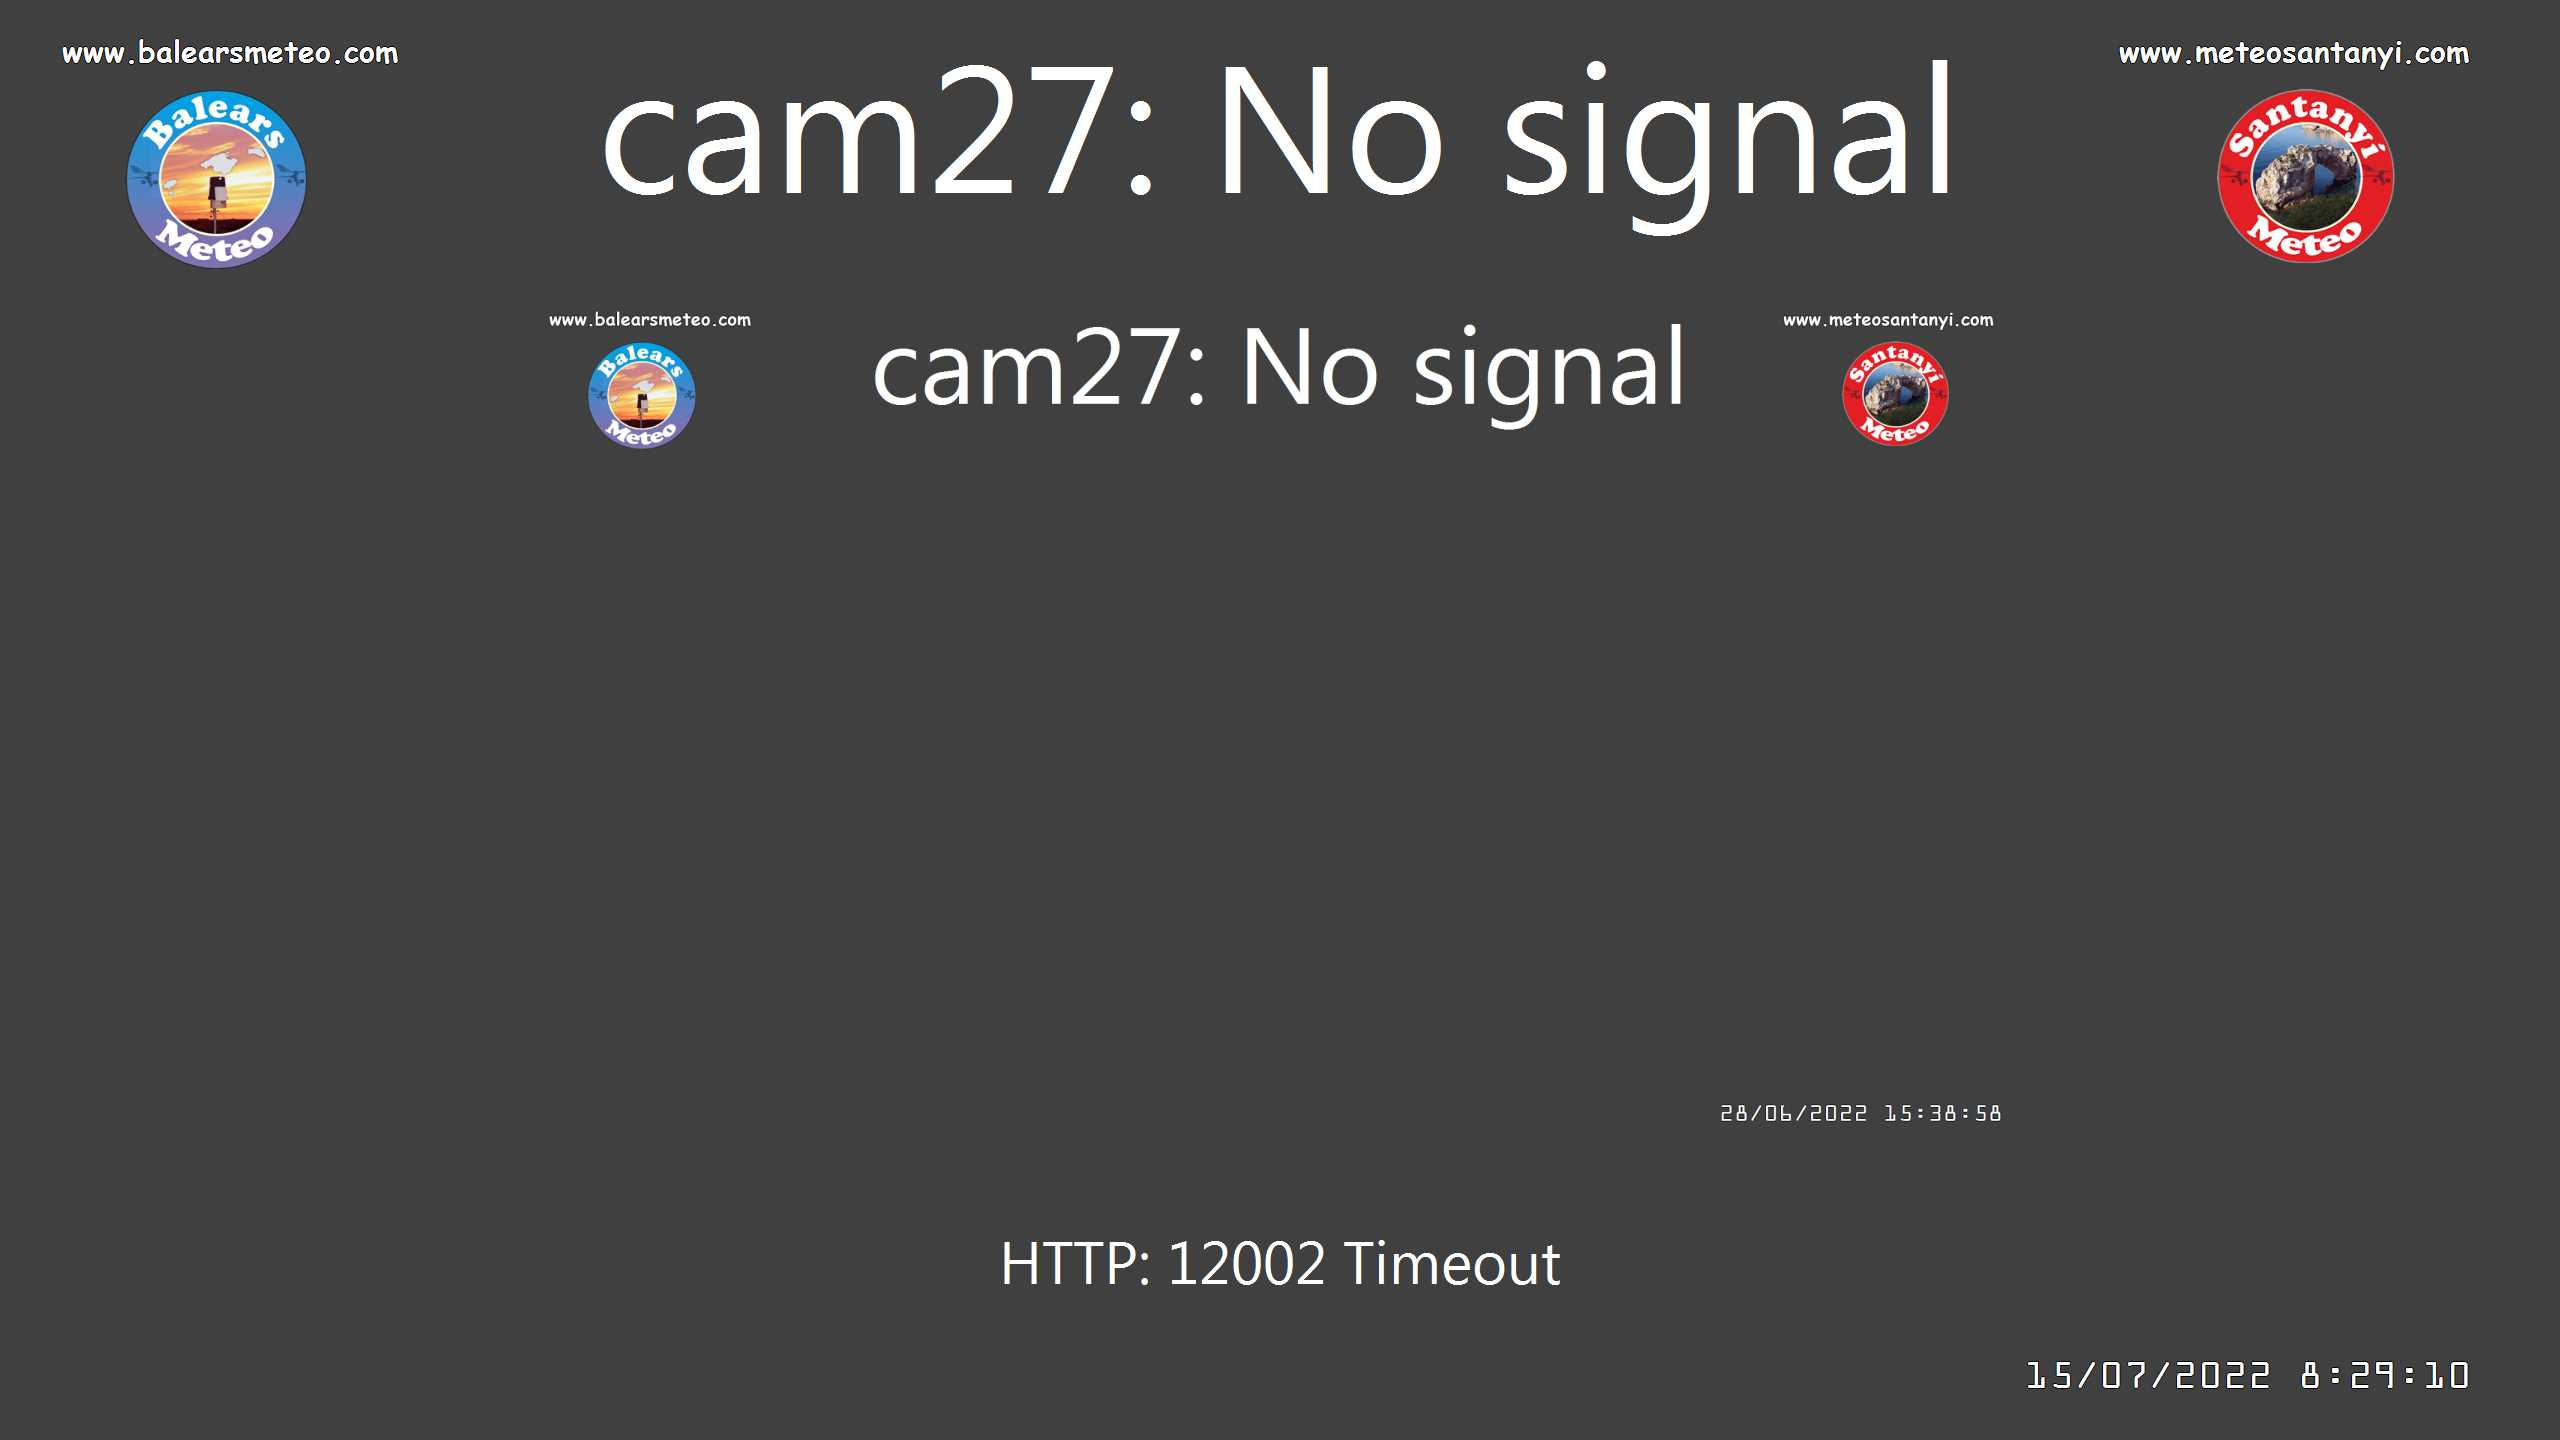 Webcam Cala Figuera